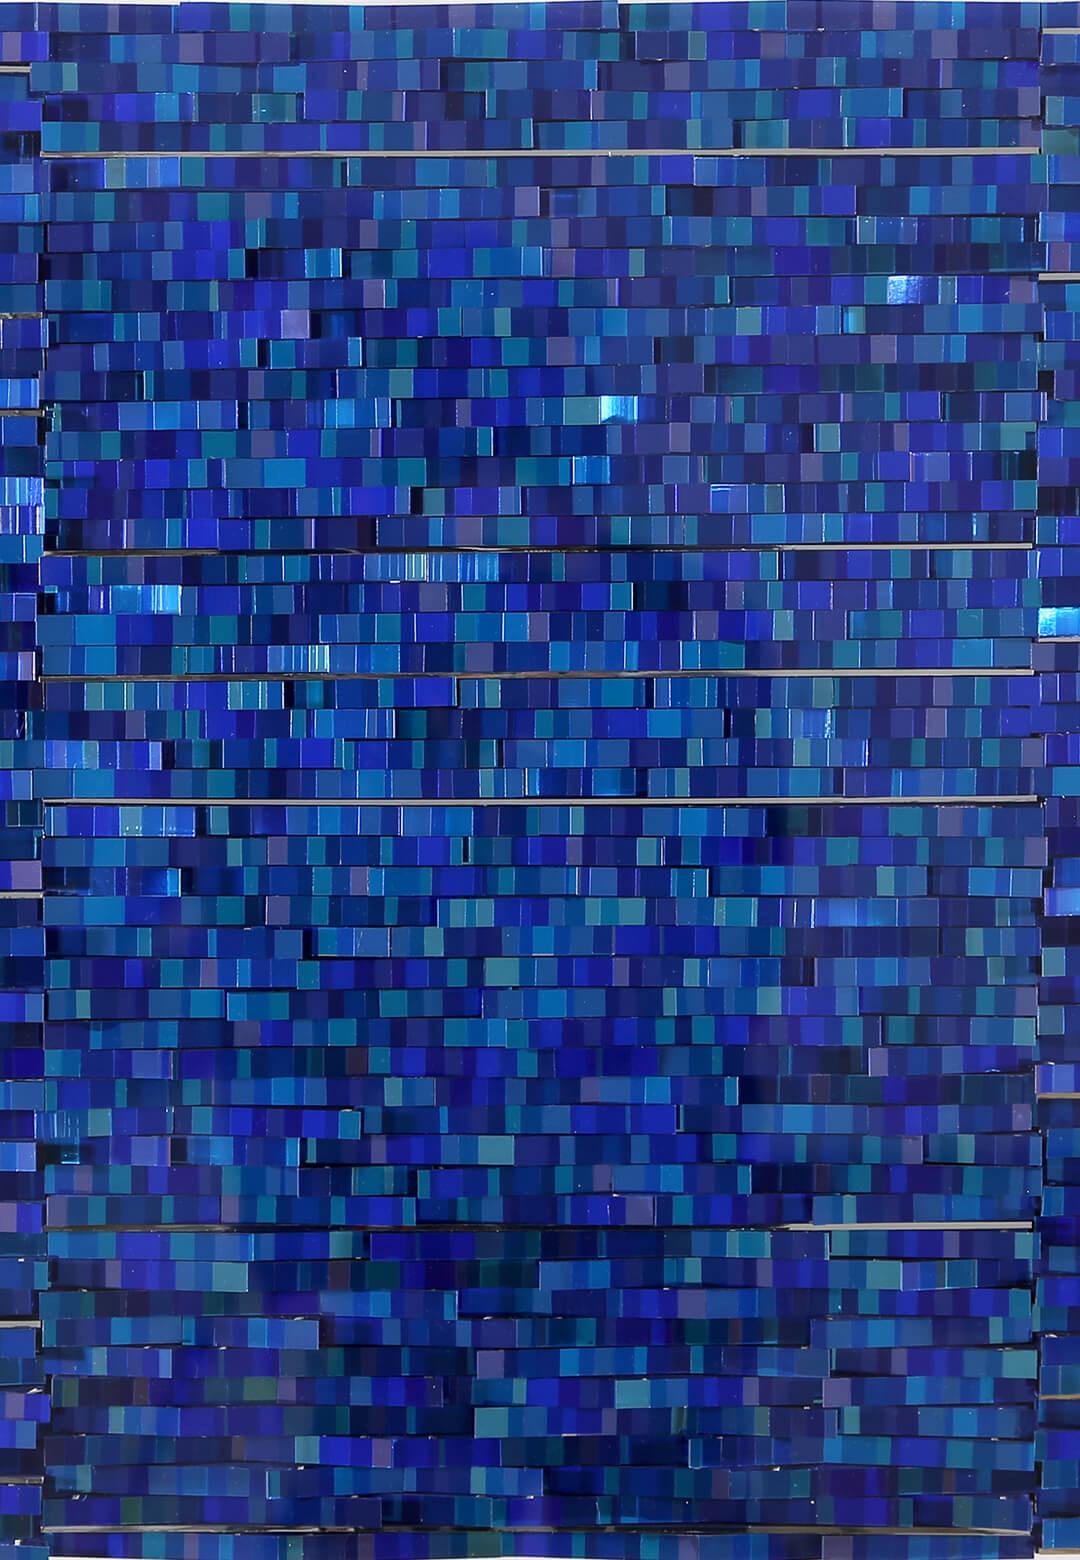 'Blue Reflection Lines' by Katsumi Hayakawa | Sovereign Asian Art Prize | Katsumi Hayakawa | STIRworld